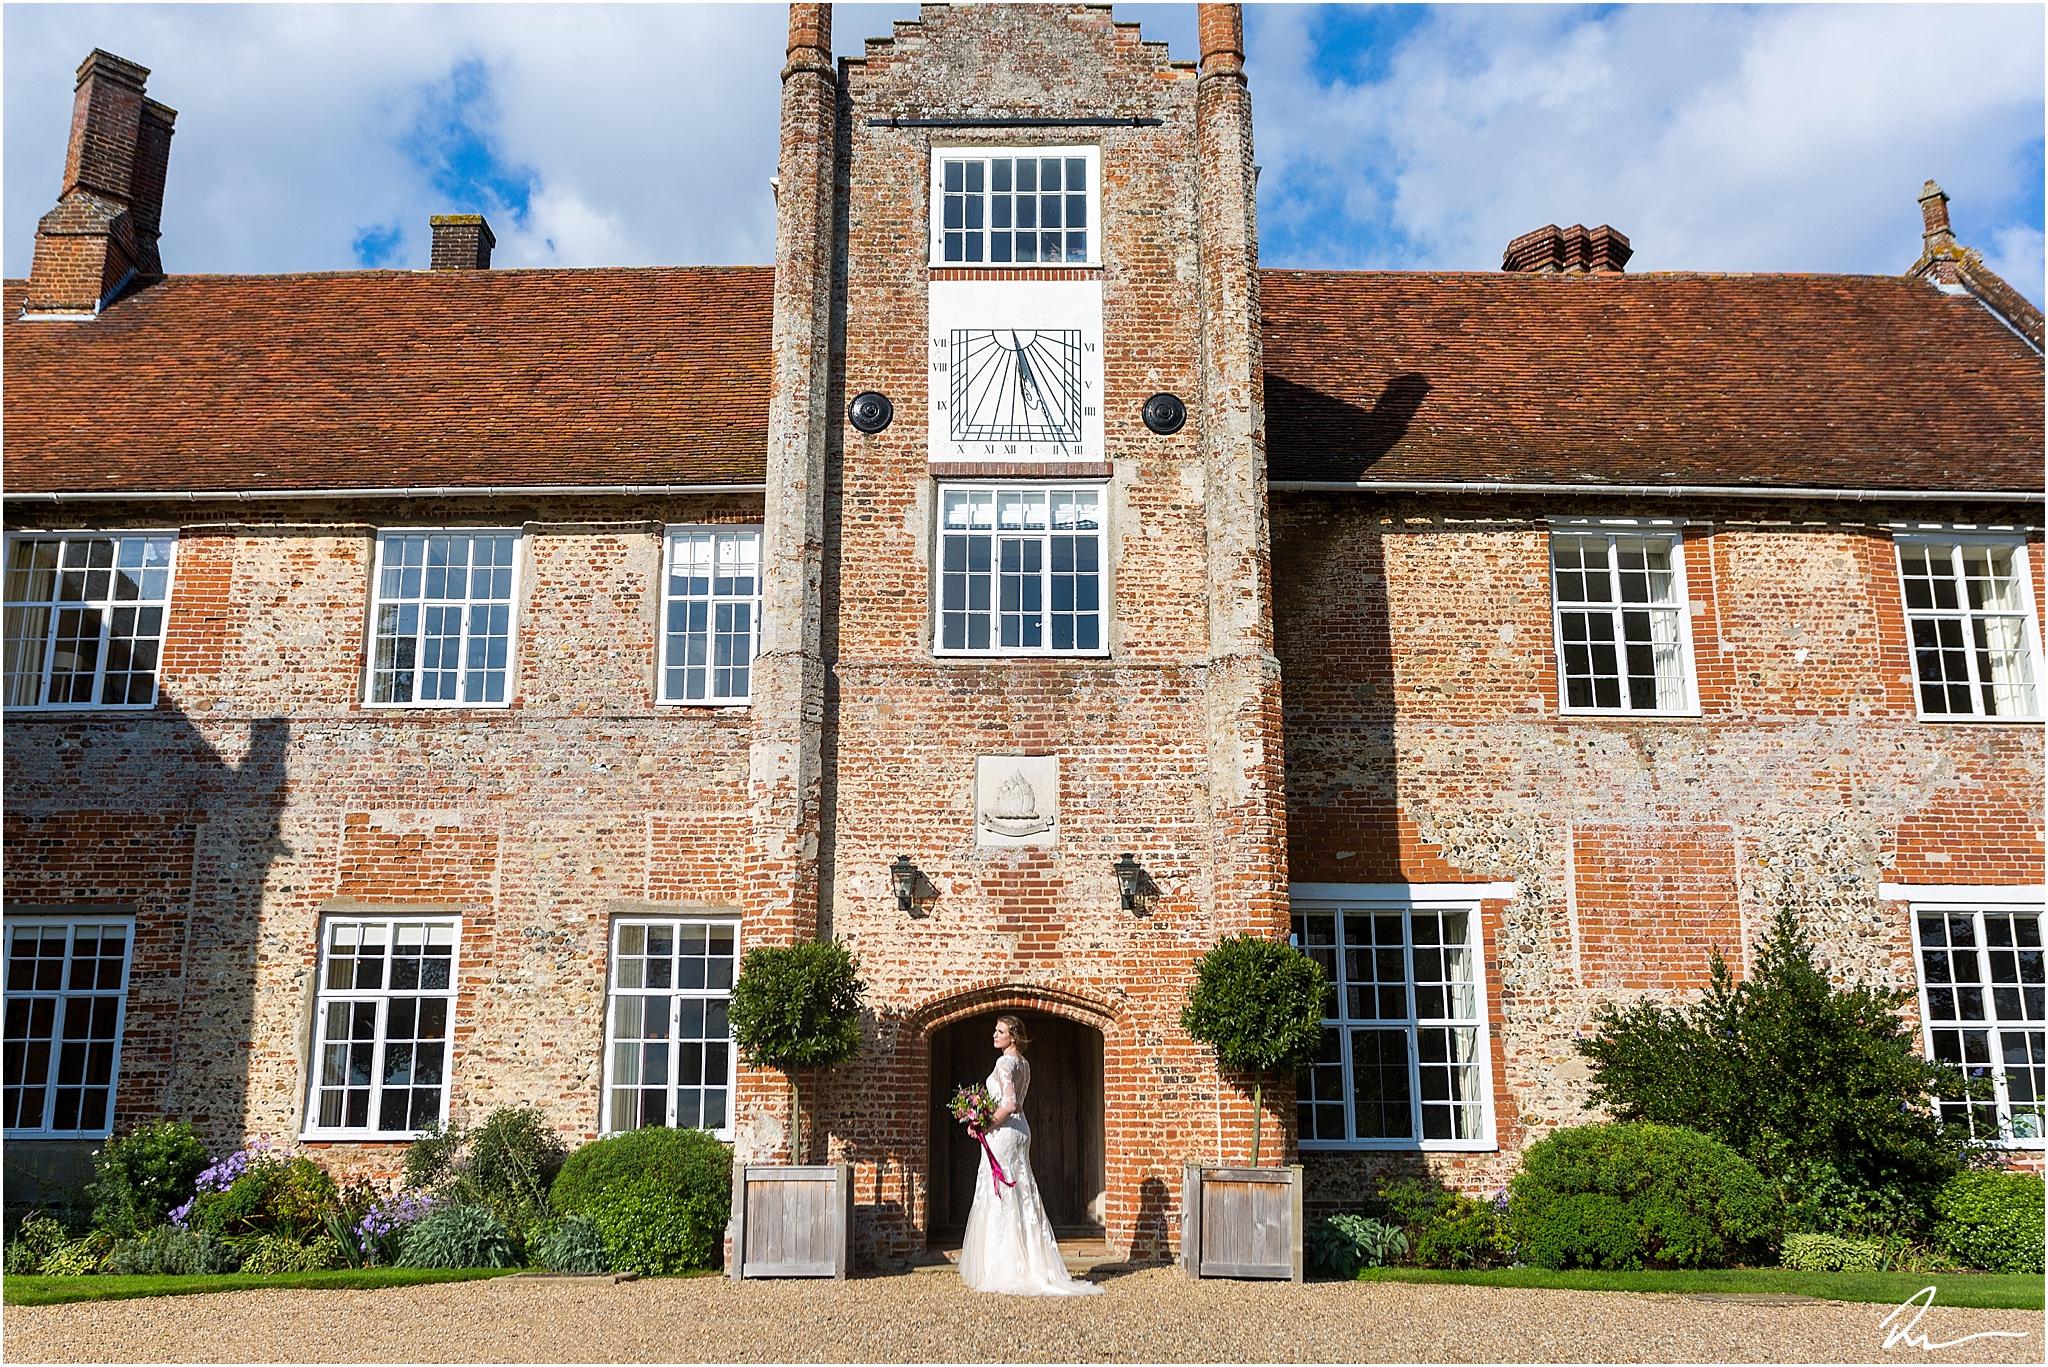 wedding-photography-consultation-ross-dean